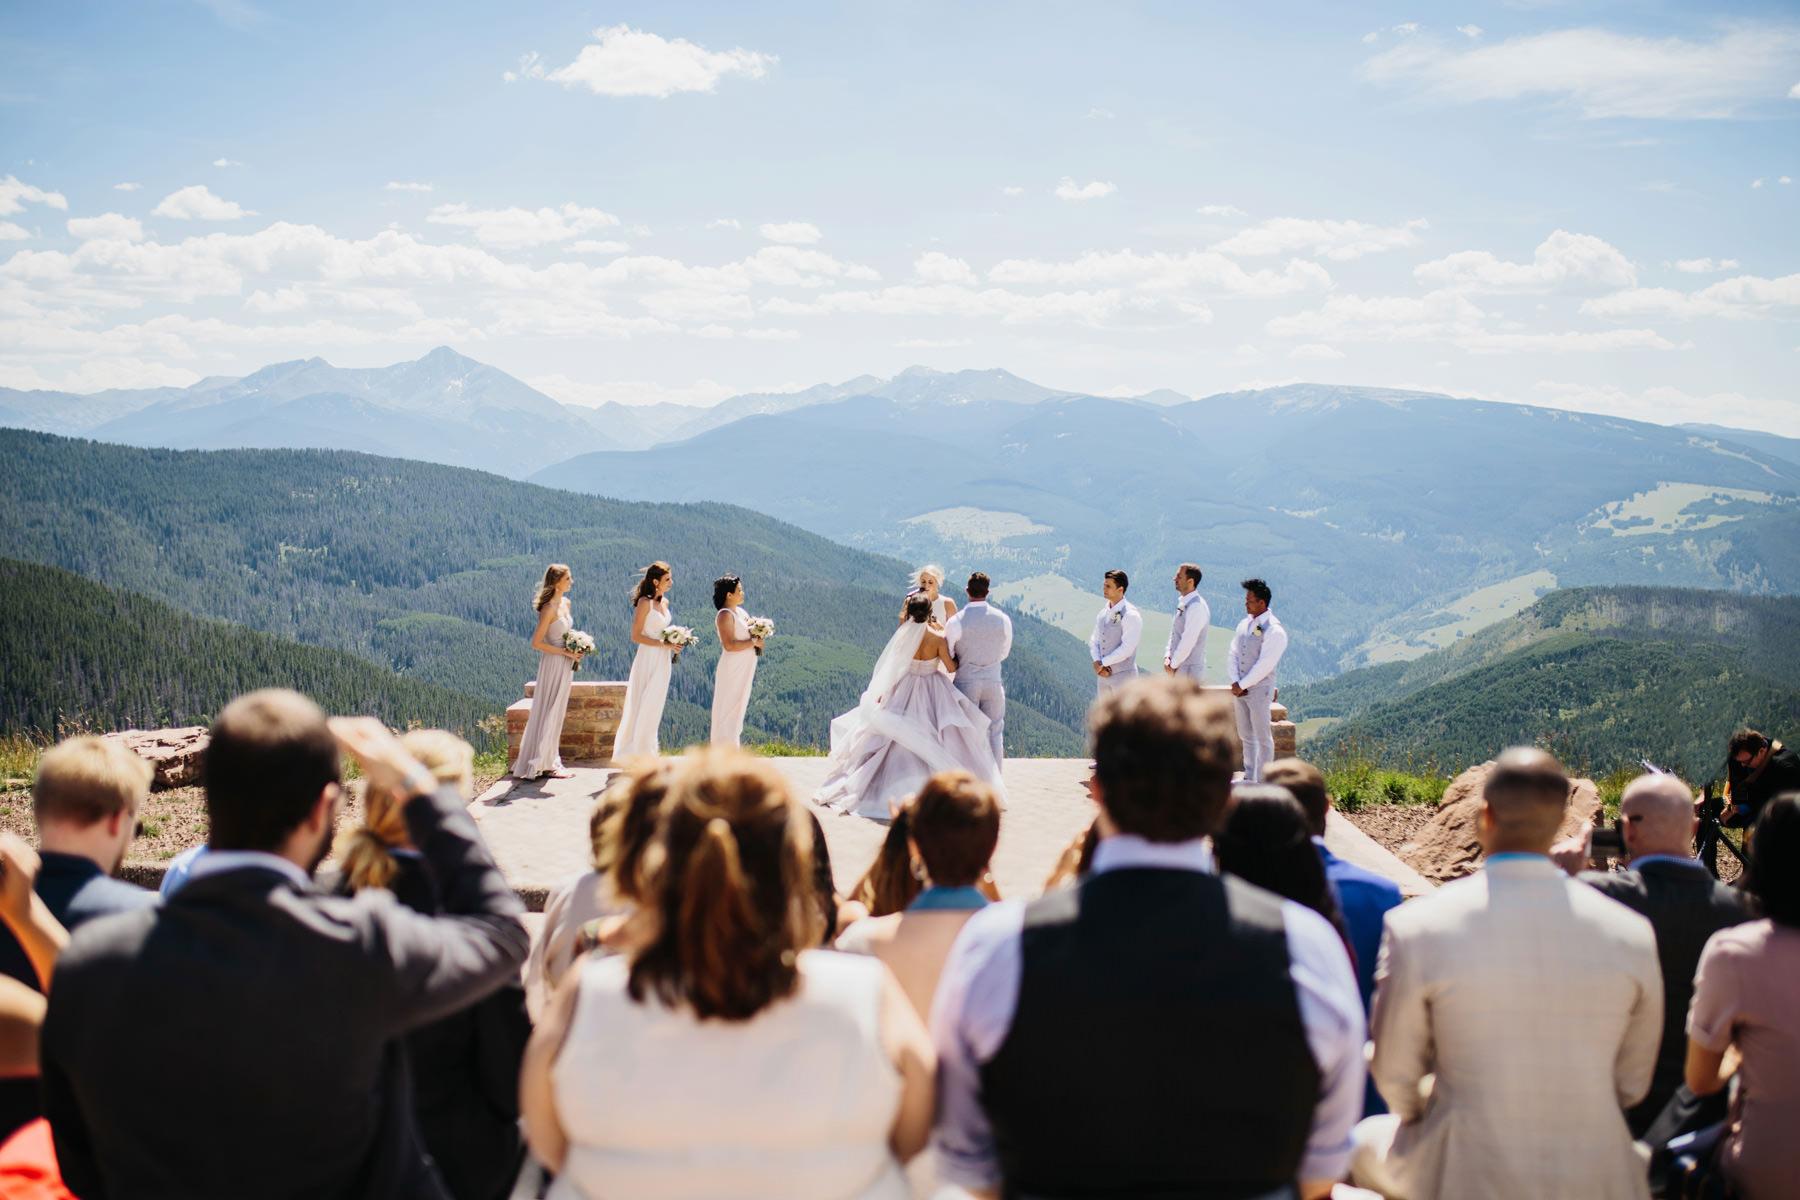 Vail Colorado Wedding Deck_ Kindling Wedding Photography35.JPG